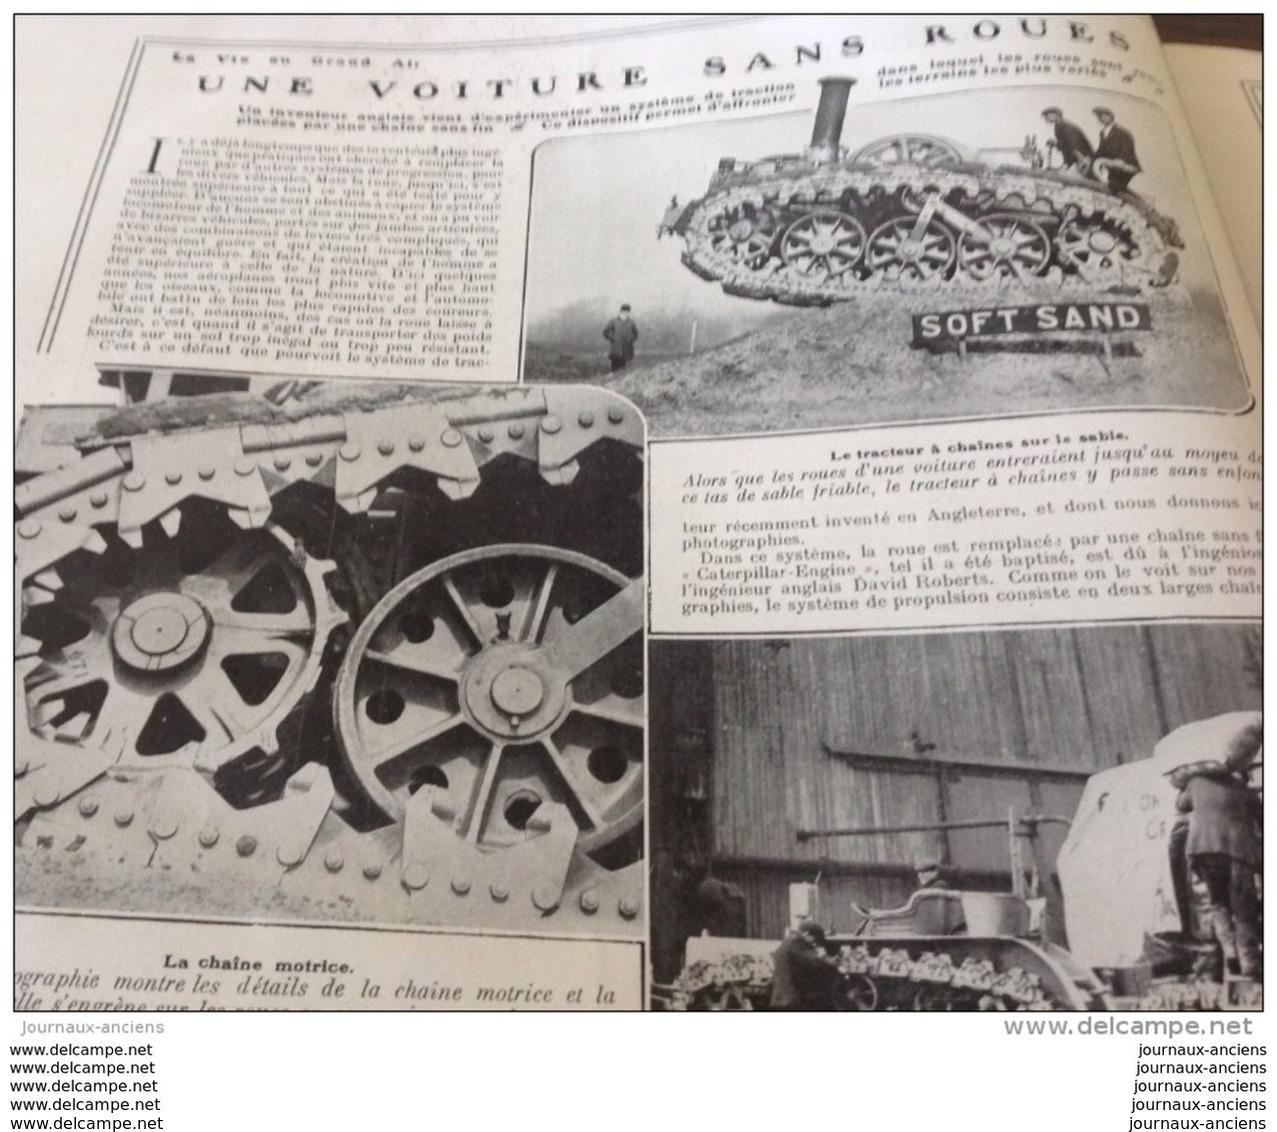 1908 VOITURE SANS ROUES - CHAINE MOTRICE - LE CATERPILLAR ENGINE - DAVID ROBERTS - 1900 - 1949